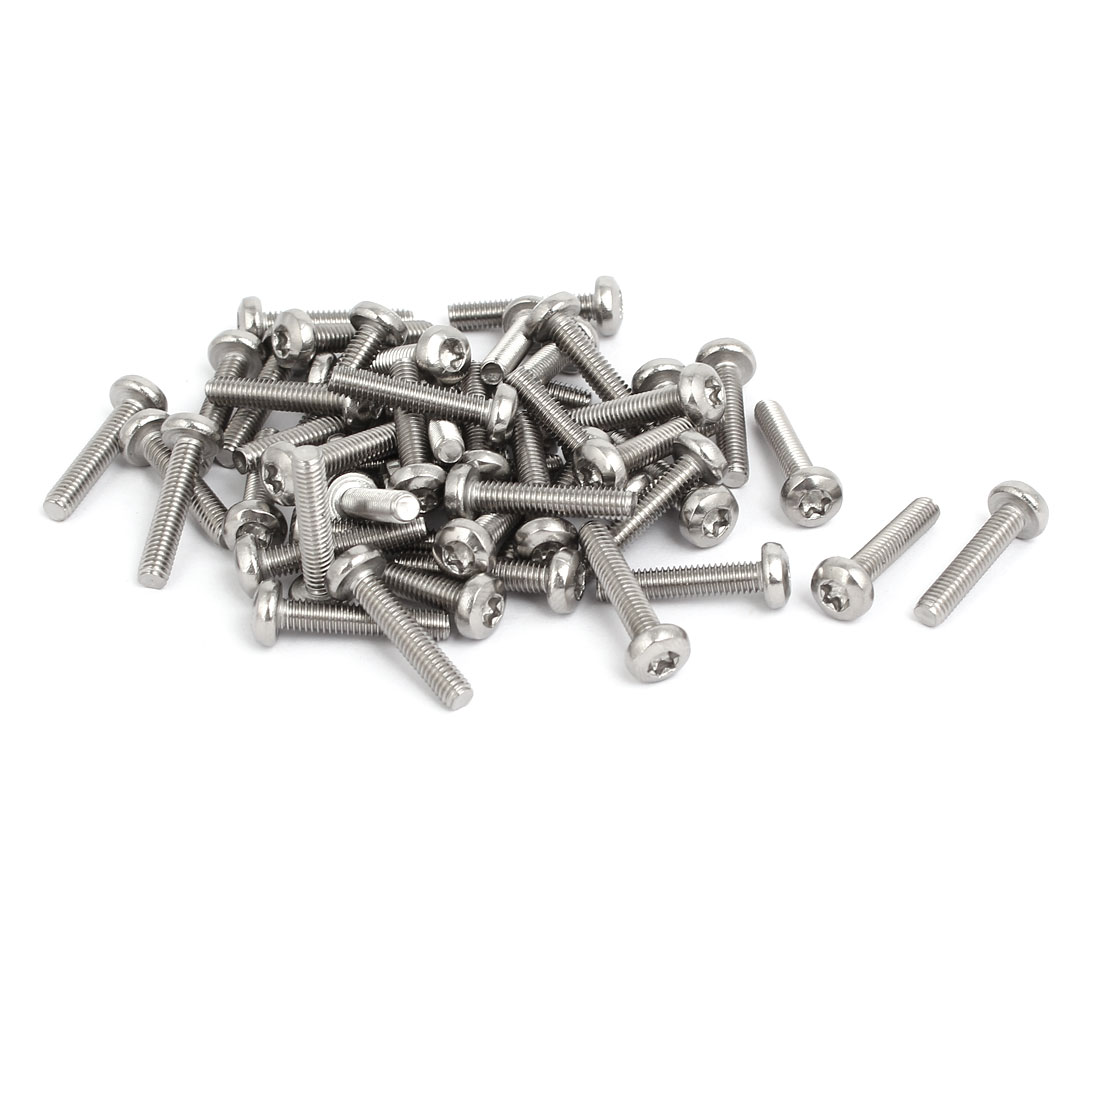 M4x20mm 304 Stainless Steel Button Head Torx Screws Bolts T20 Drive 50pcs